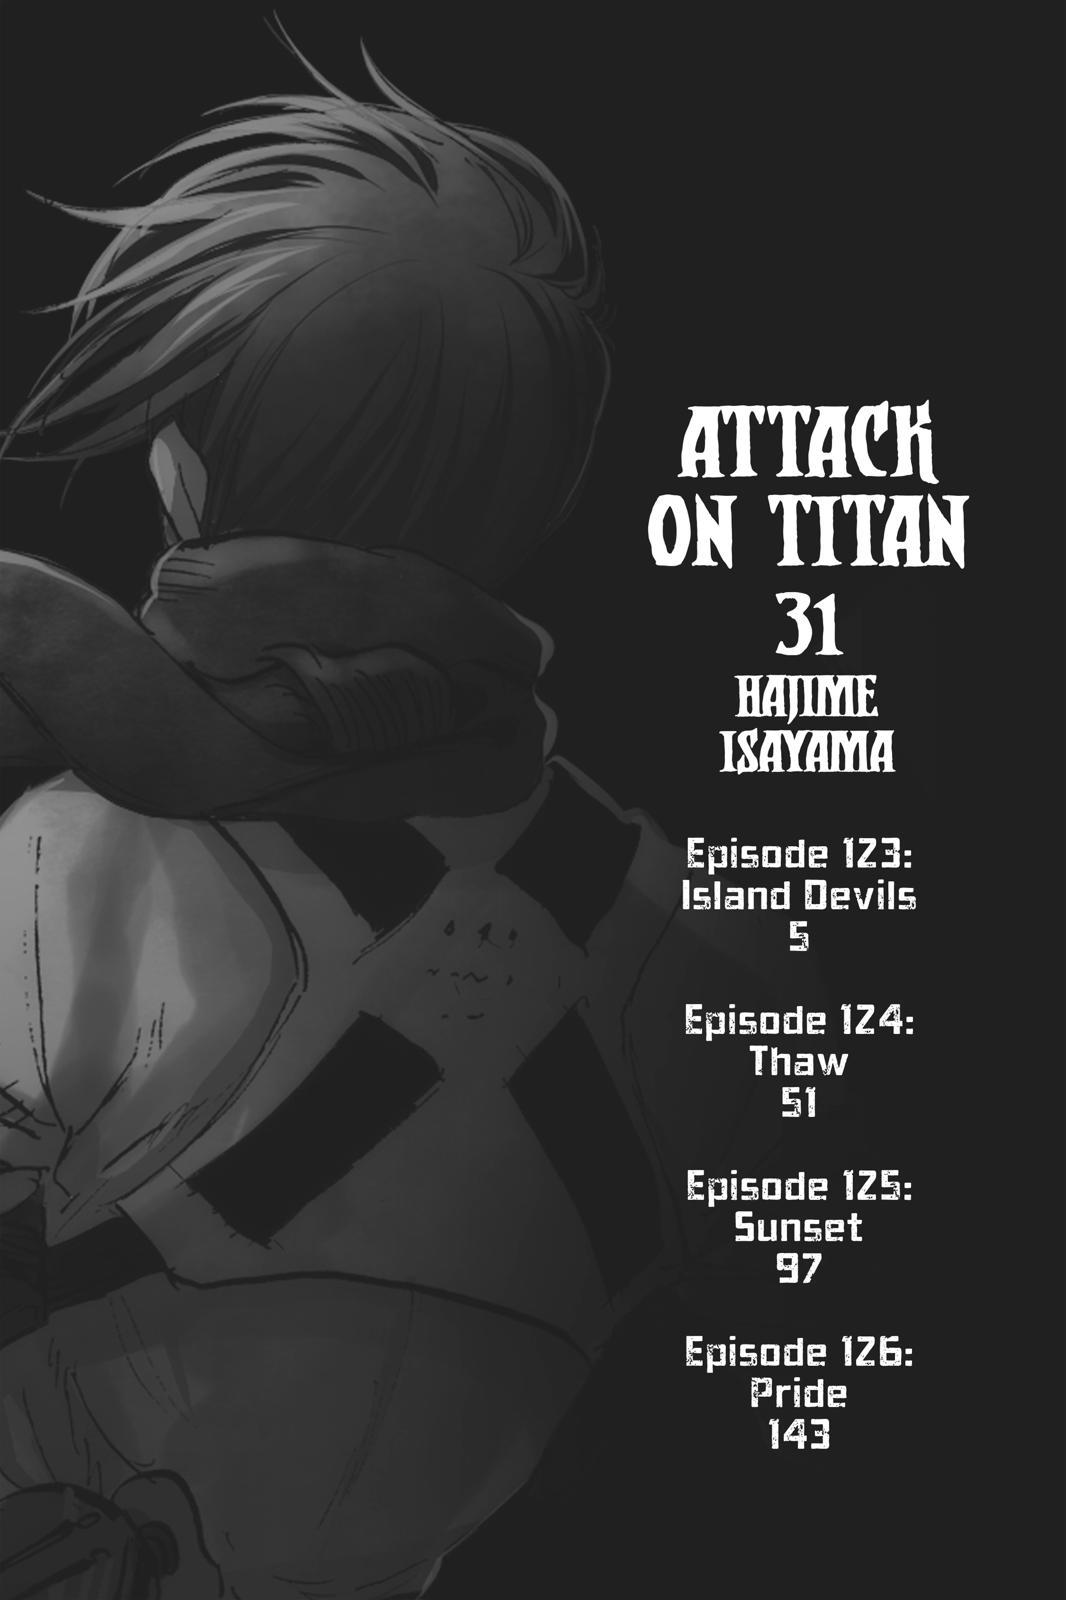 Attack On Titan, Episode 123 image 002